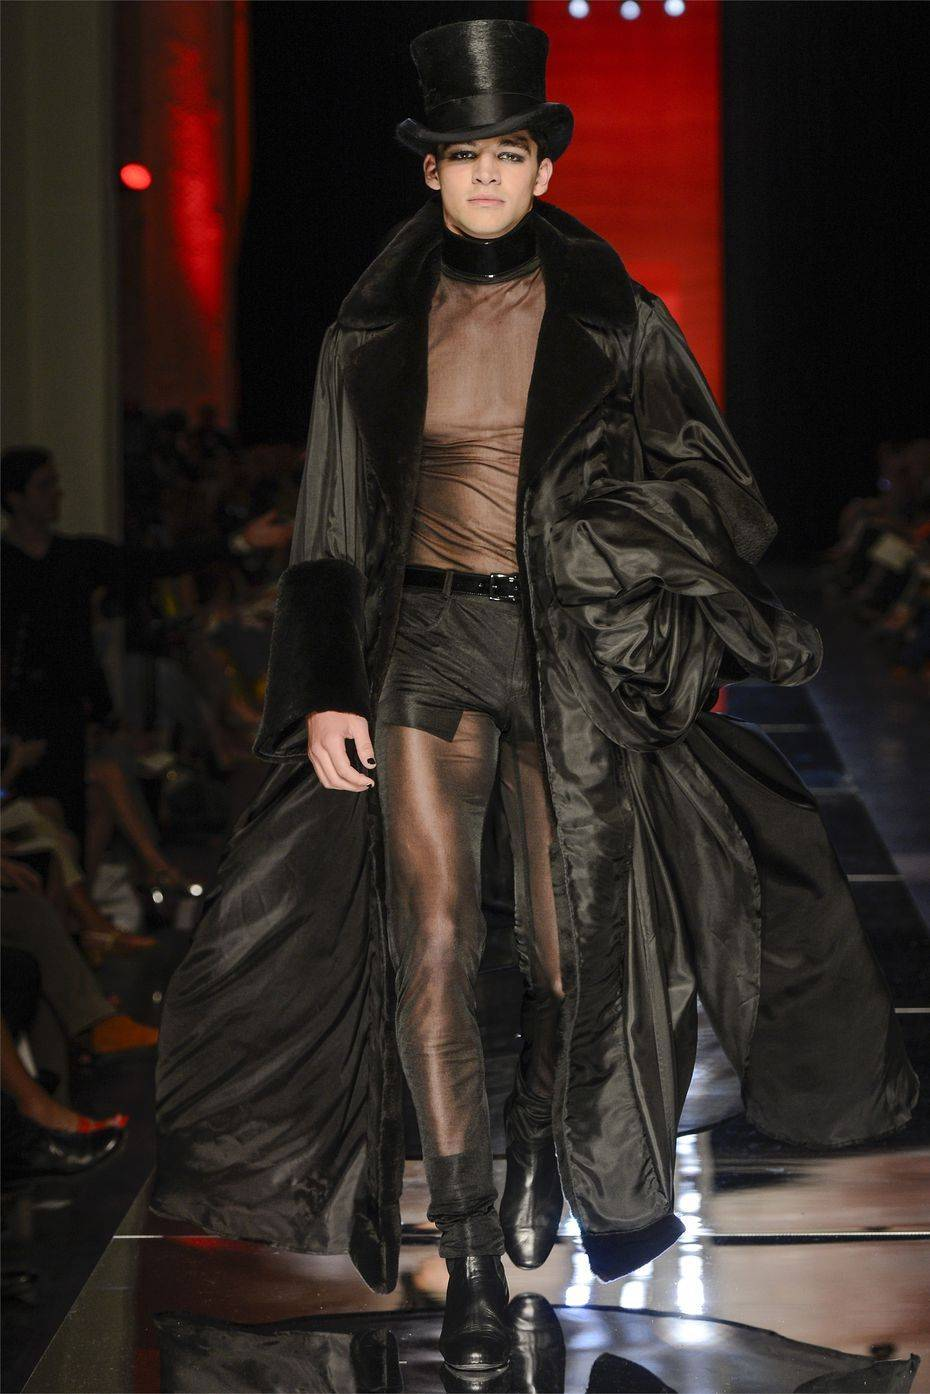 Jean paul gaultier men 39 s haute couture fall winter 2012 for Haute couture men